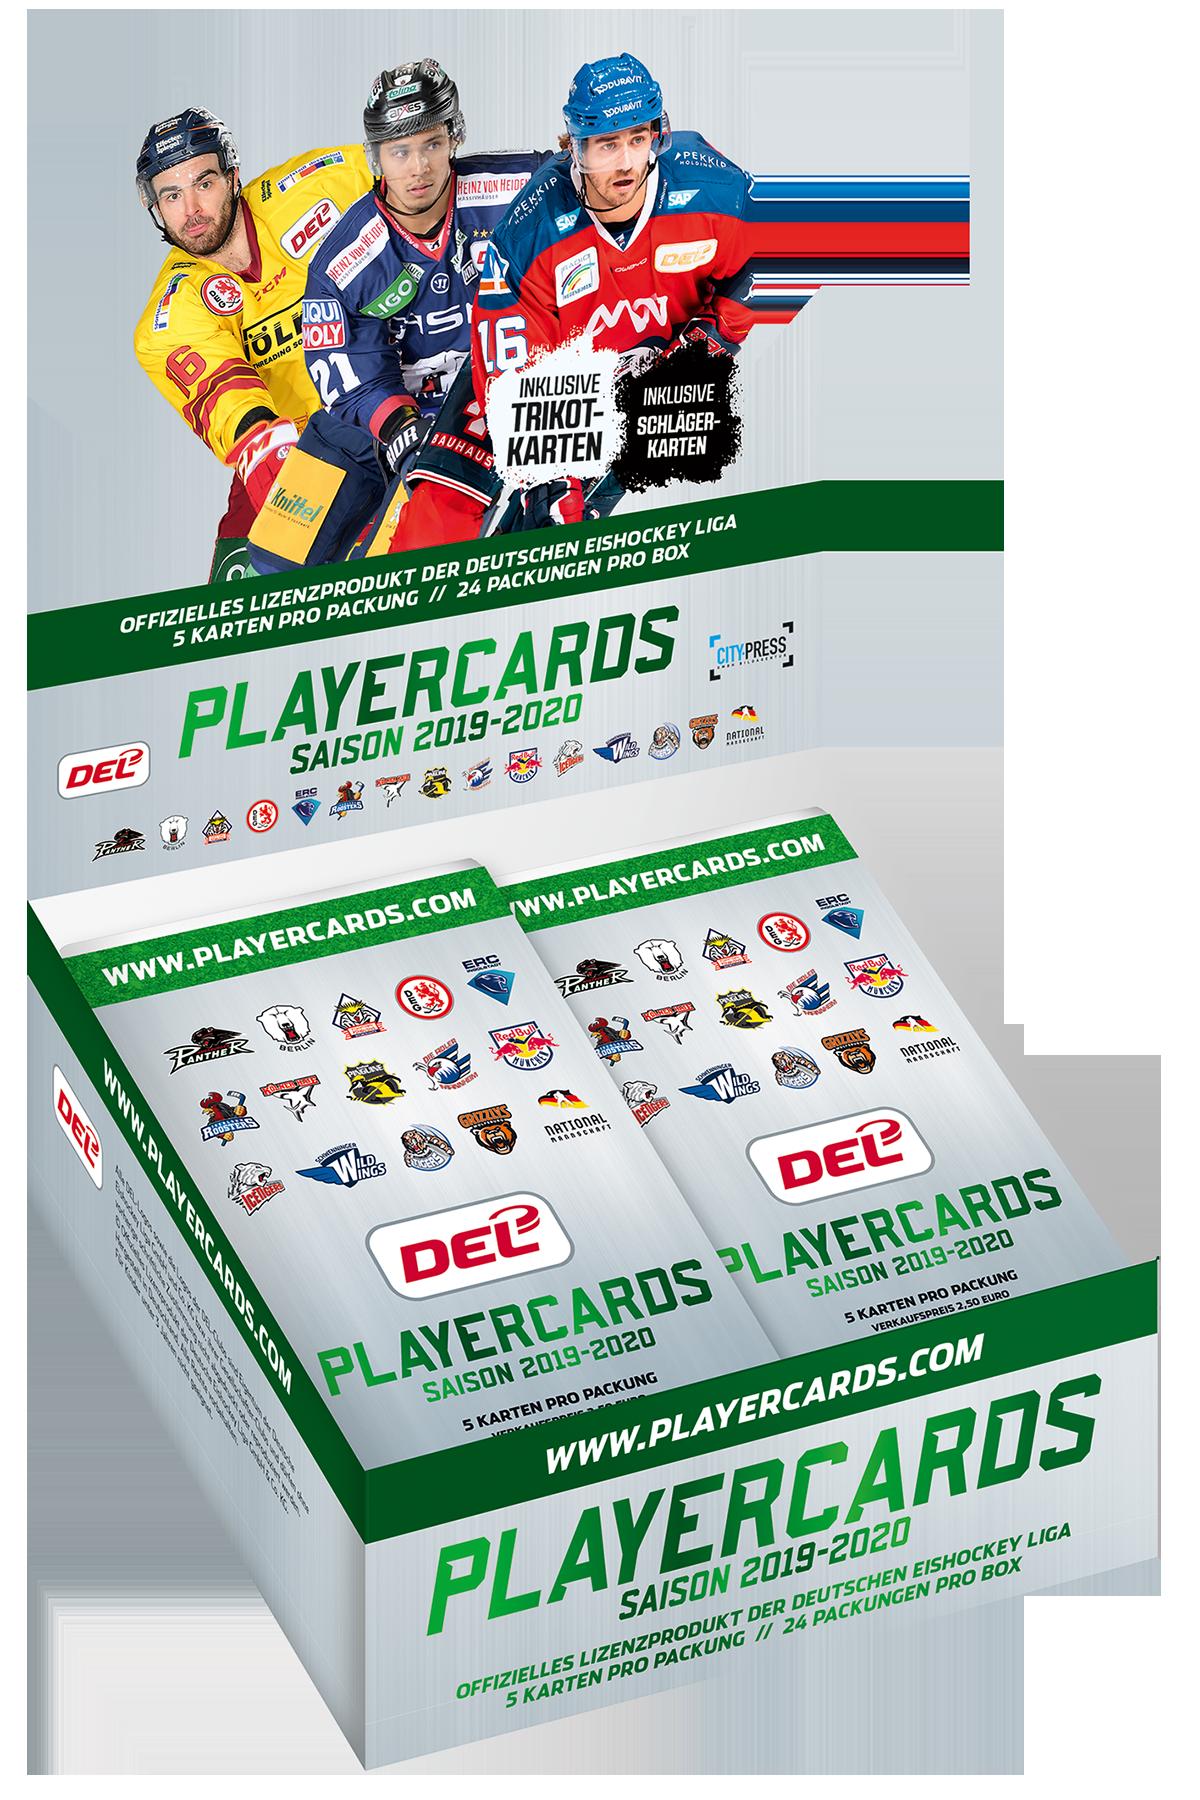 Playercards DEL 2019-2020